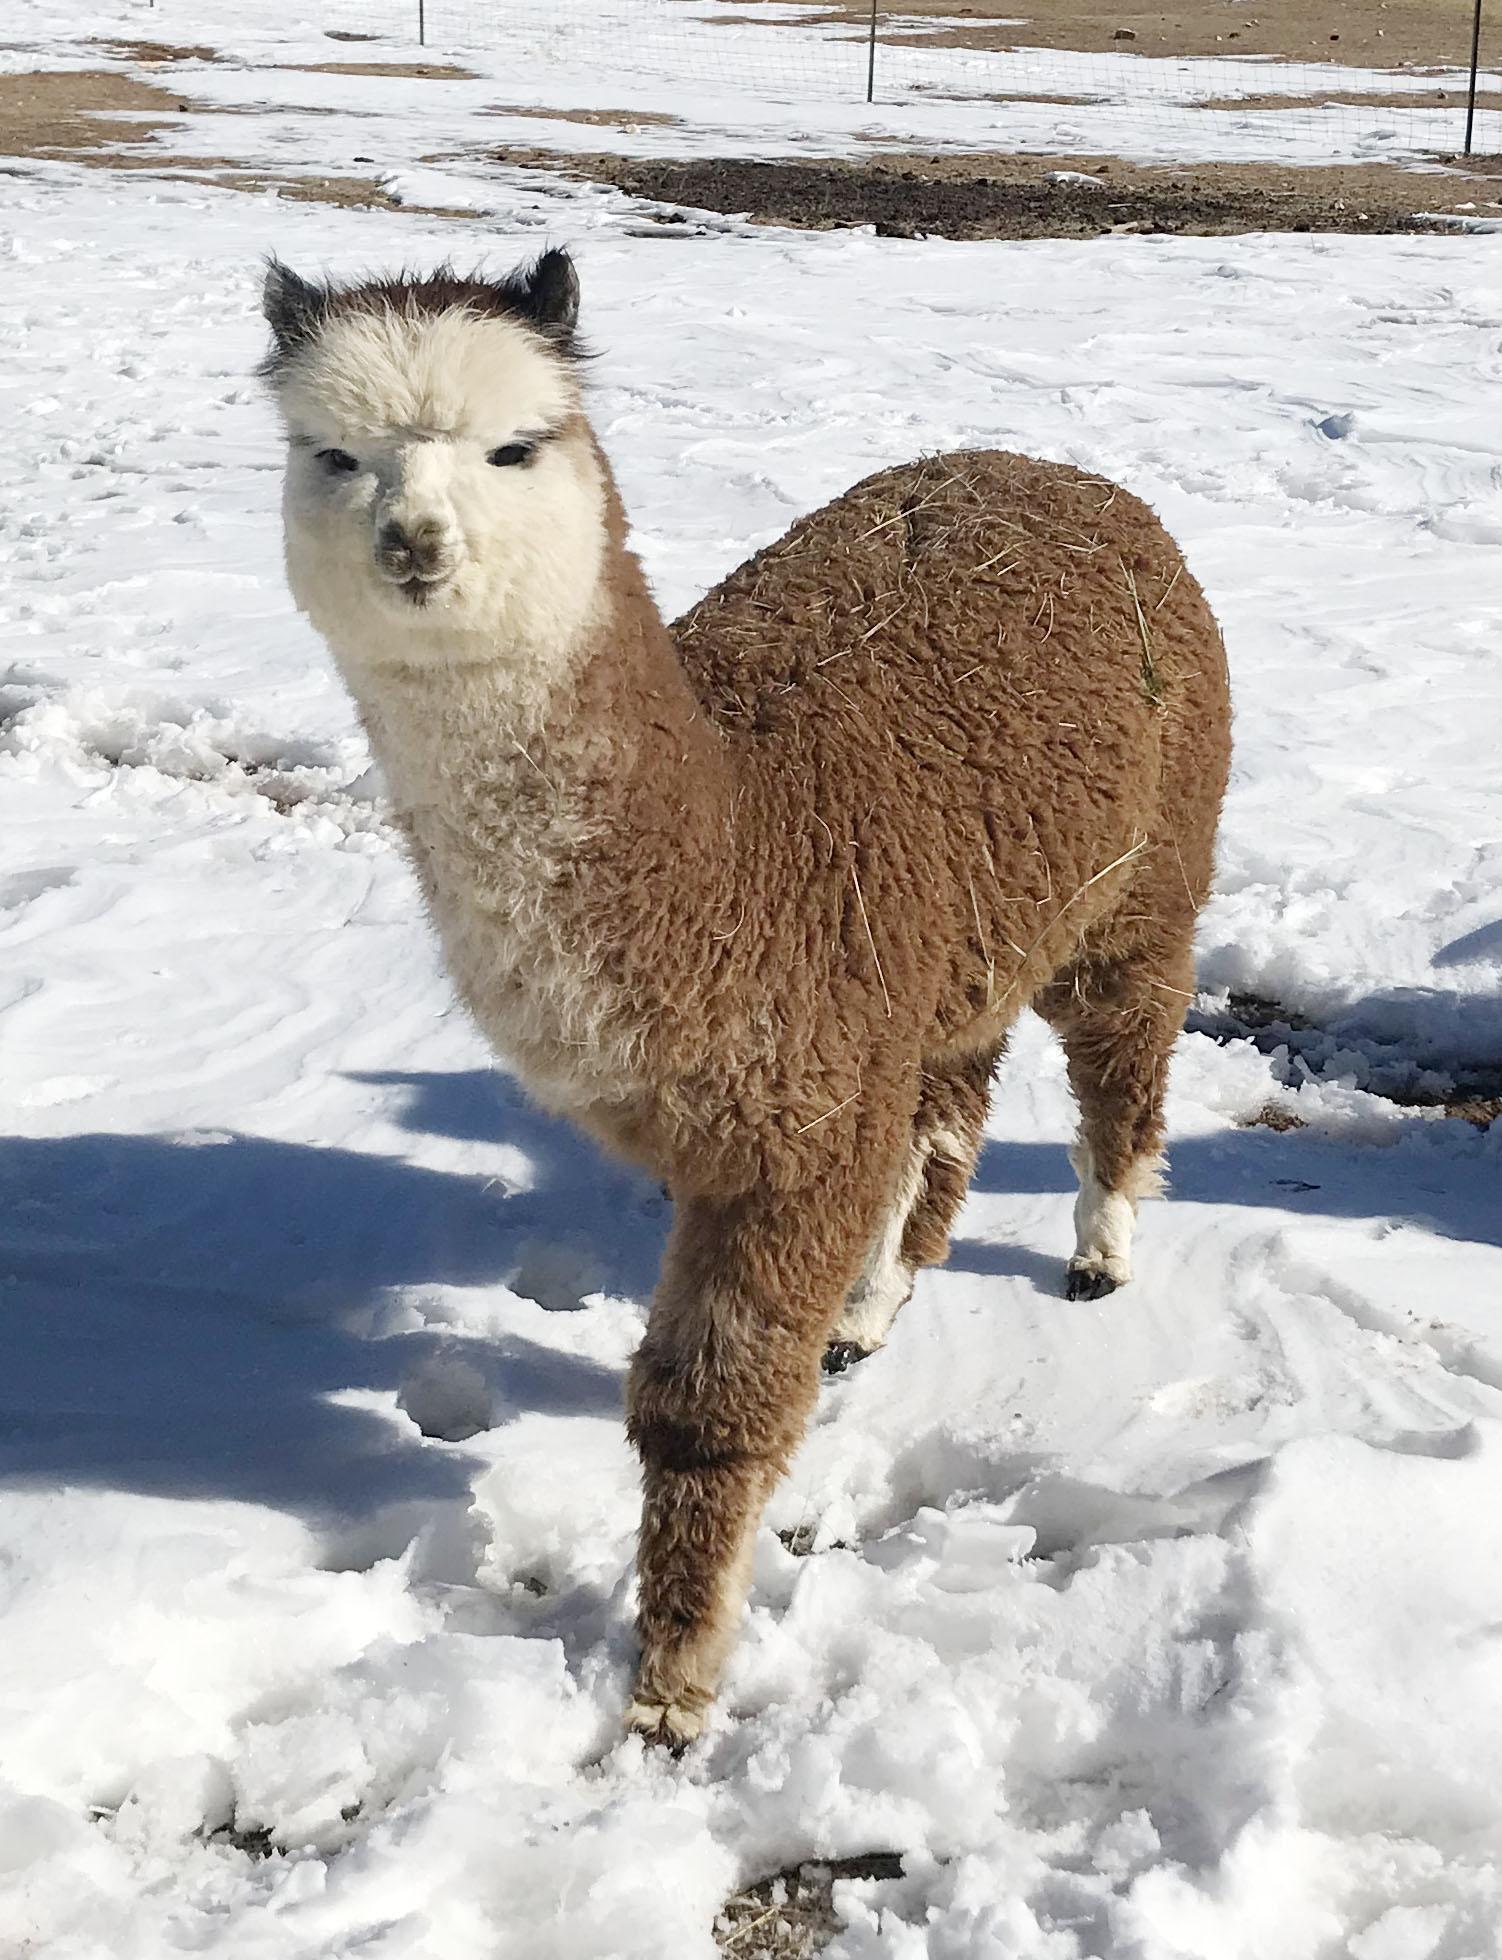 Ferdy the alpaca